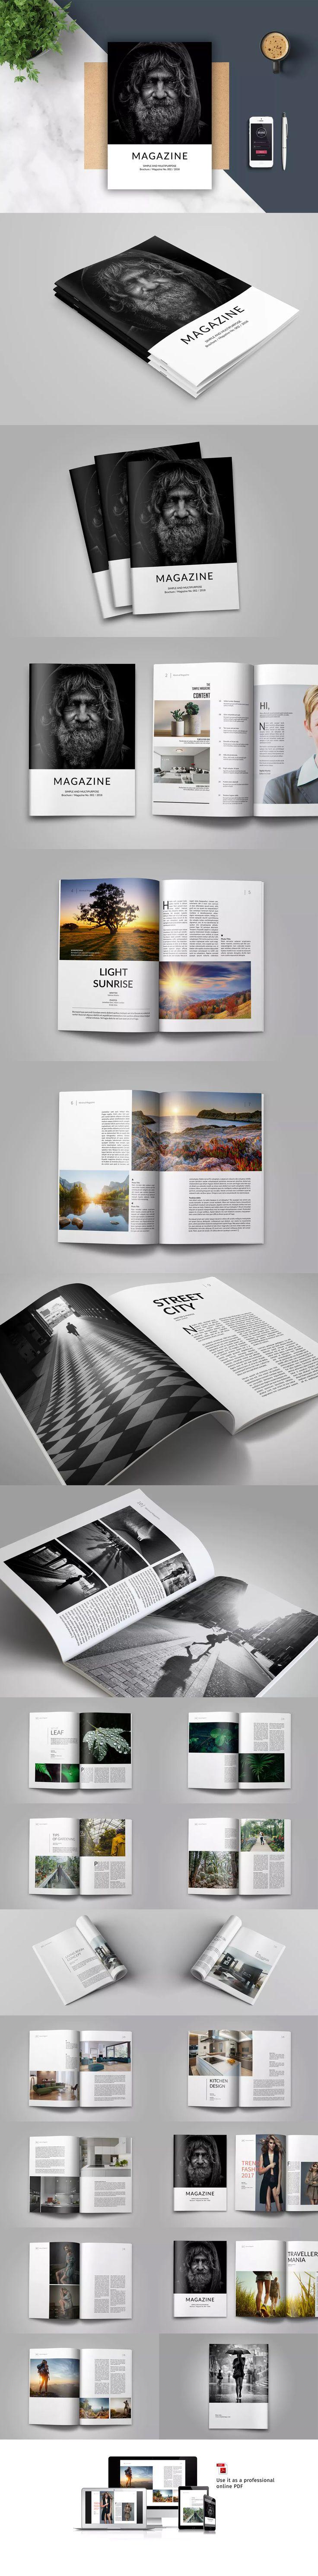 simple magazine layout ideas muco tadkanews co